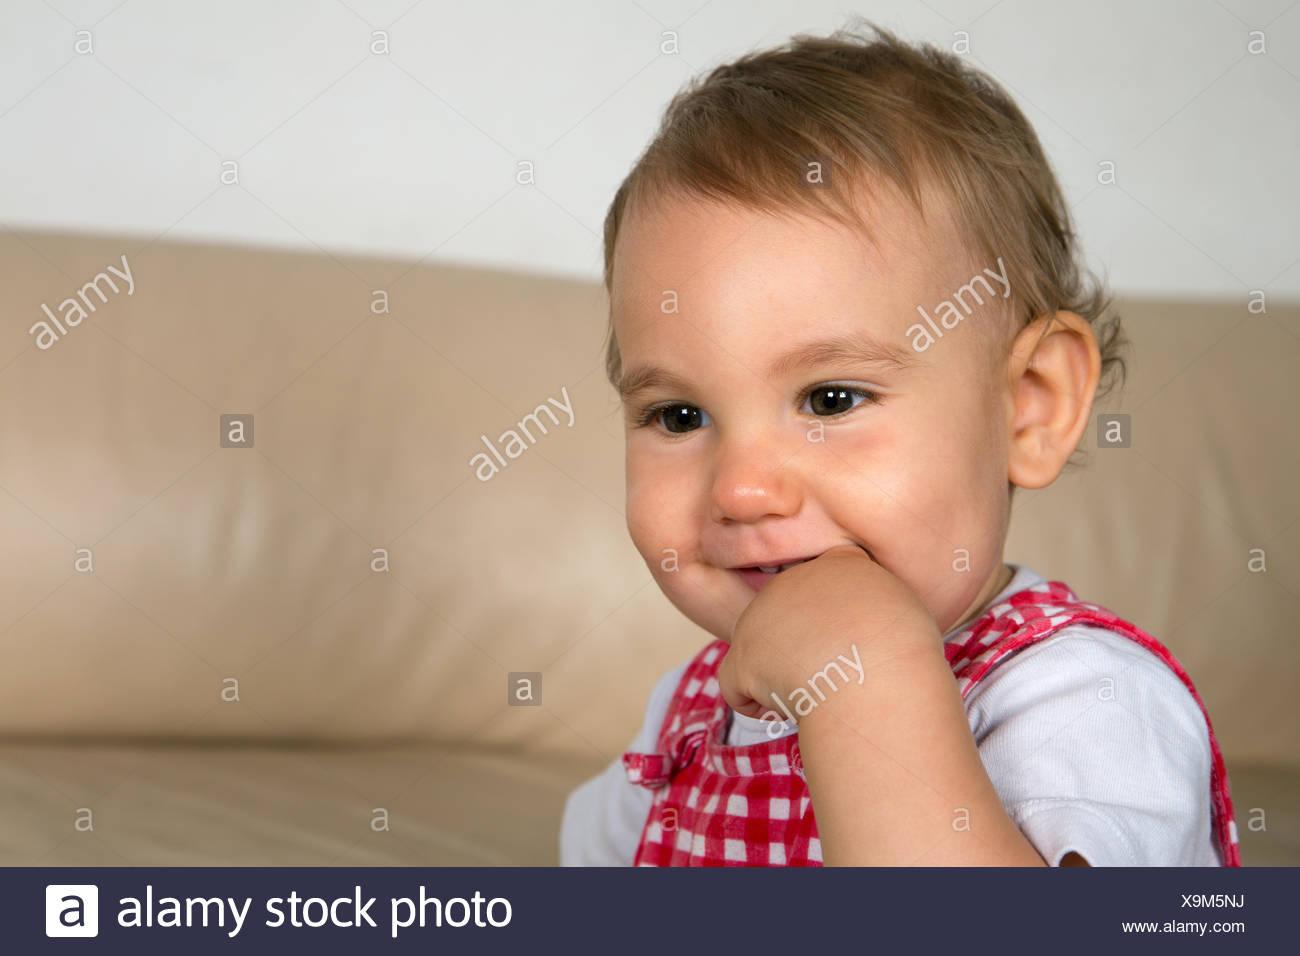 Lachendes Baby Hut Finger Im Mund Stockbild